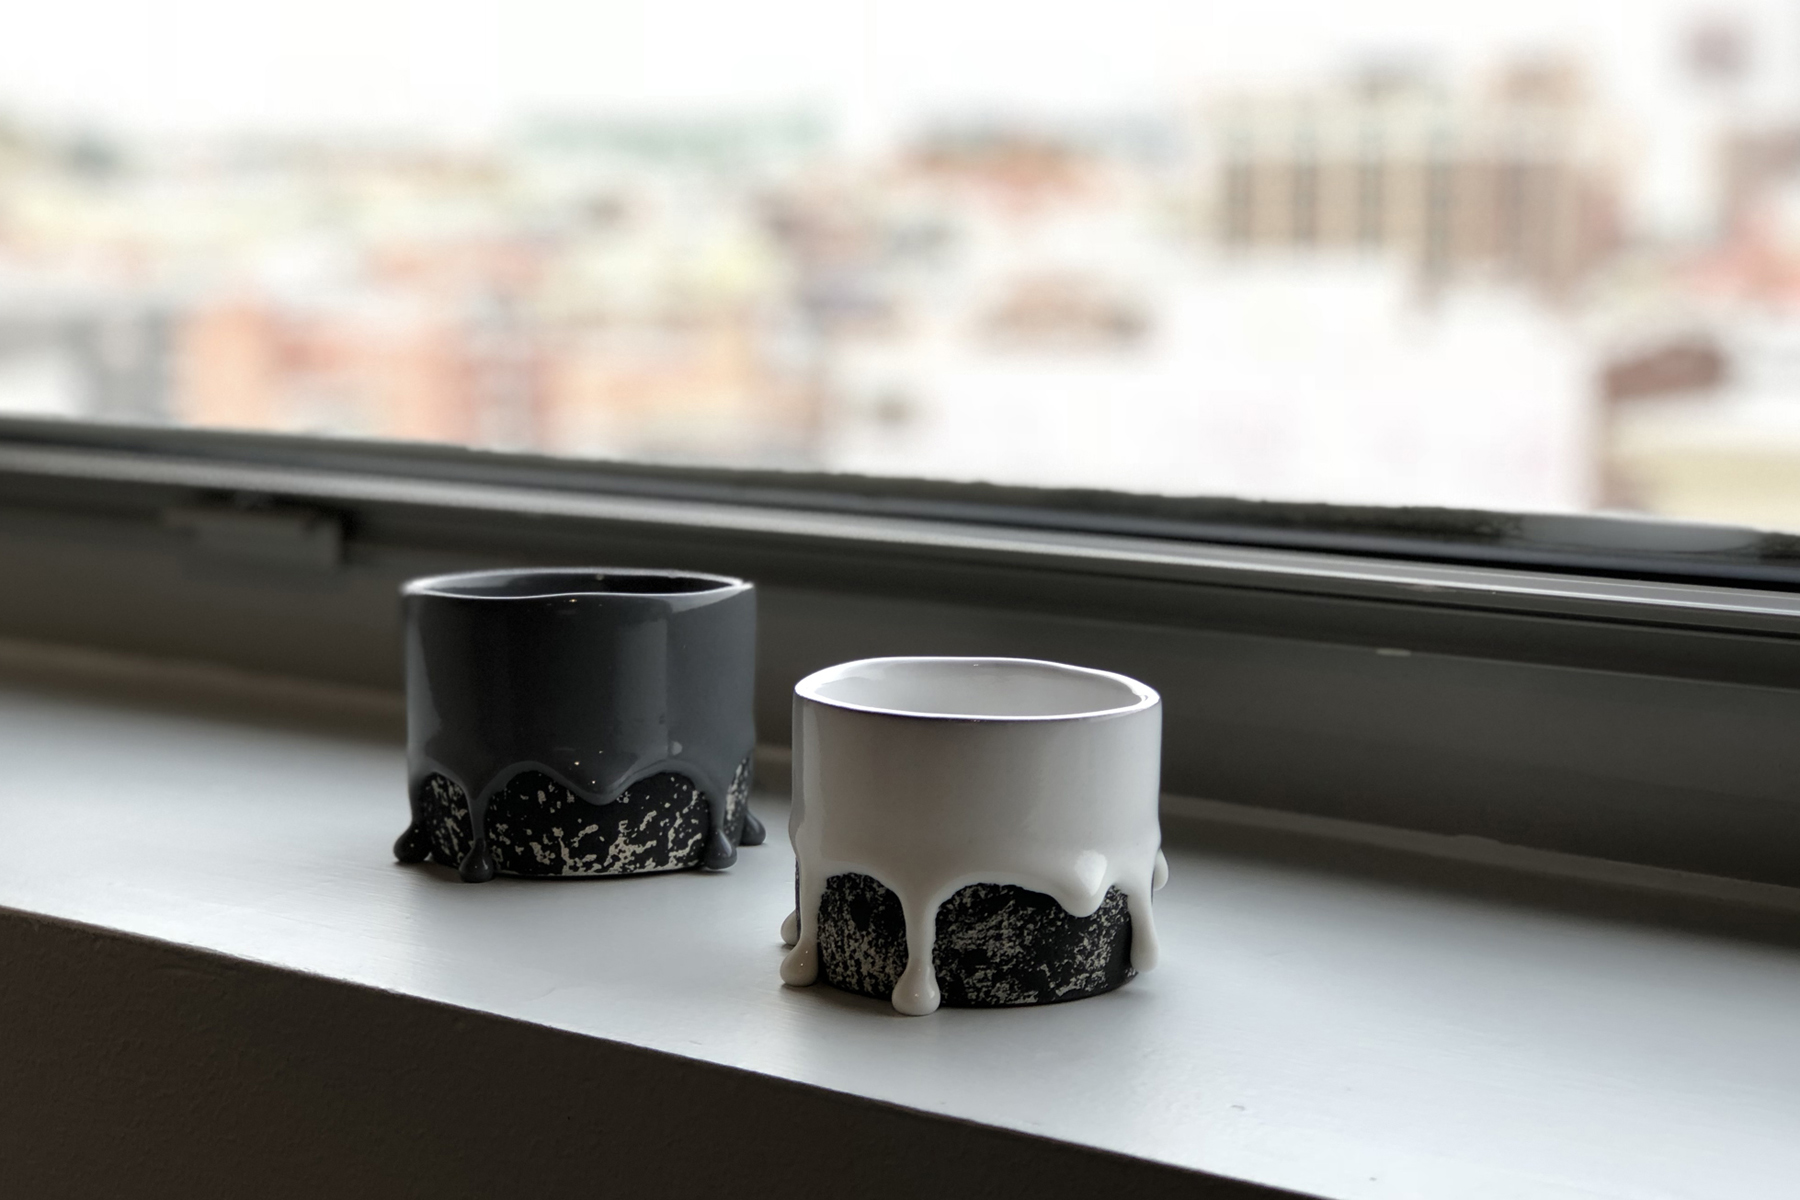 Black Dalmation Drippy Vase , 2017 Brian Giniewski   White Dalmation Drippy Vase , 2017 Brian Giniewski